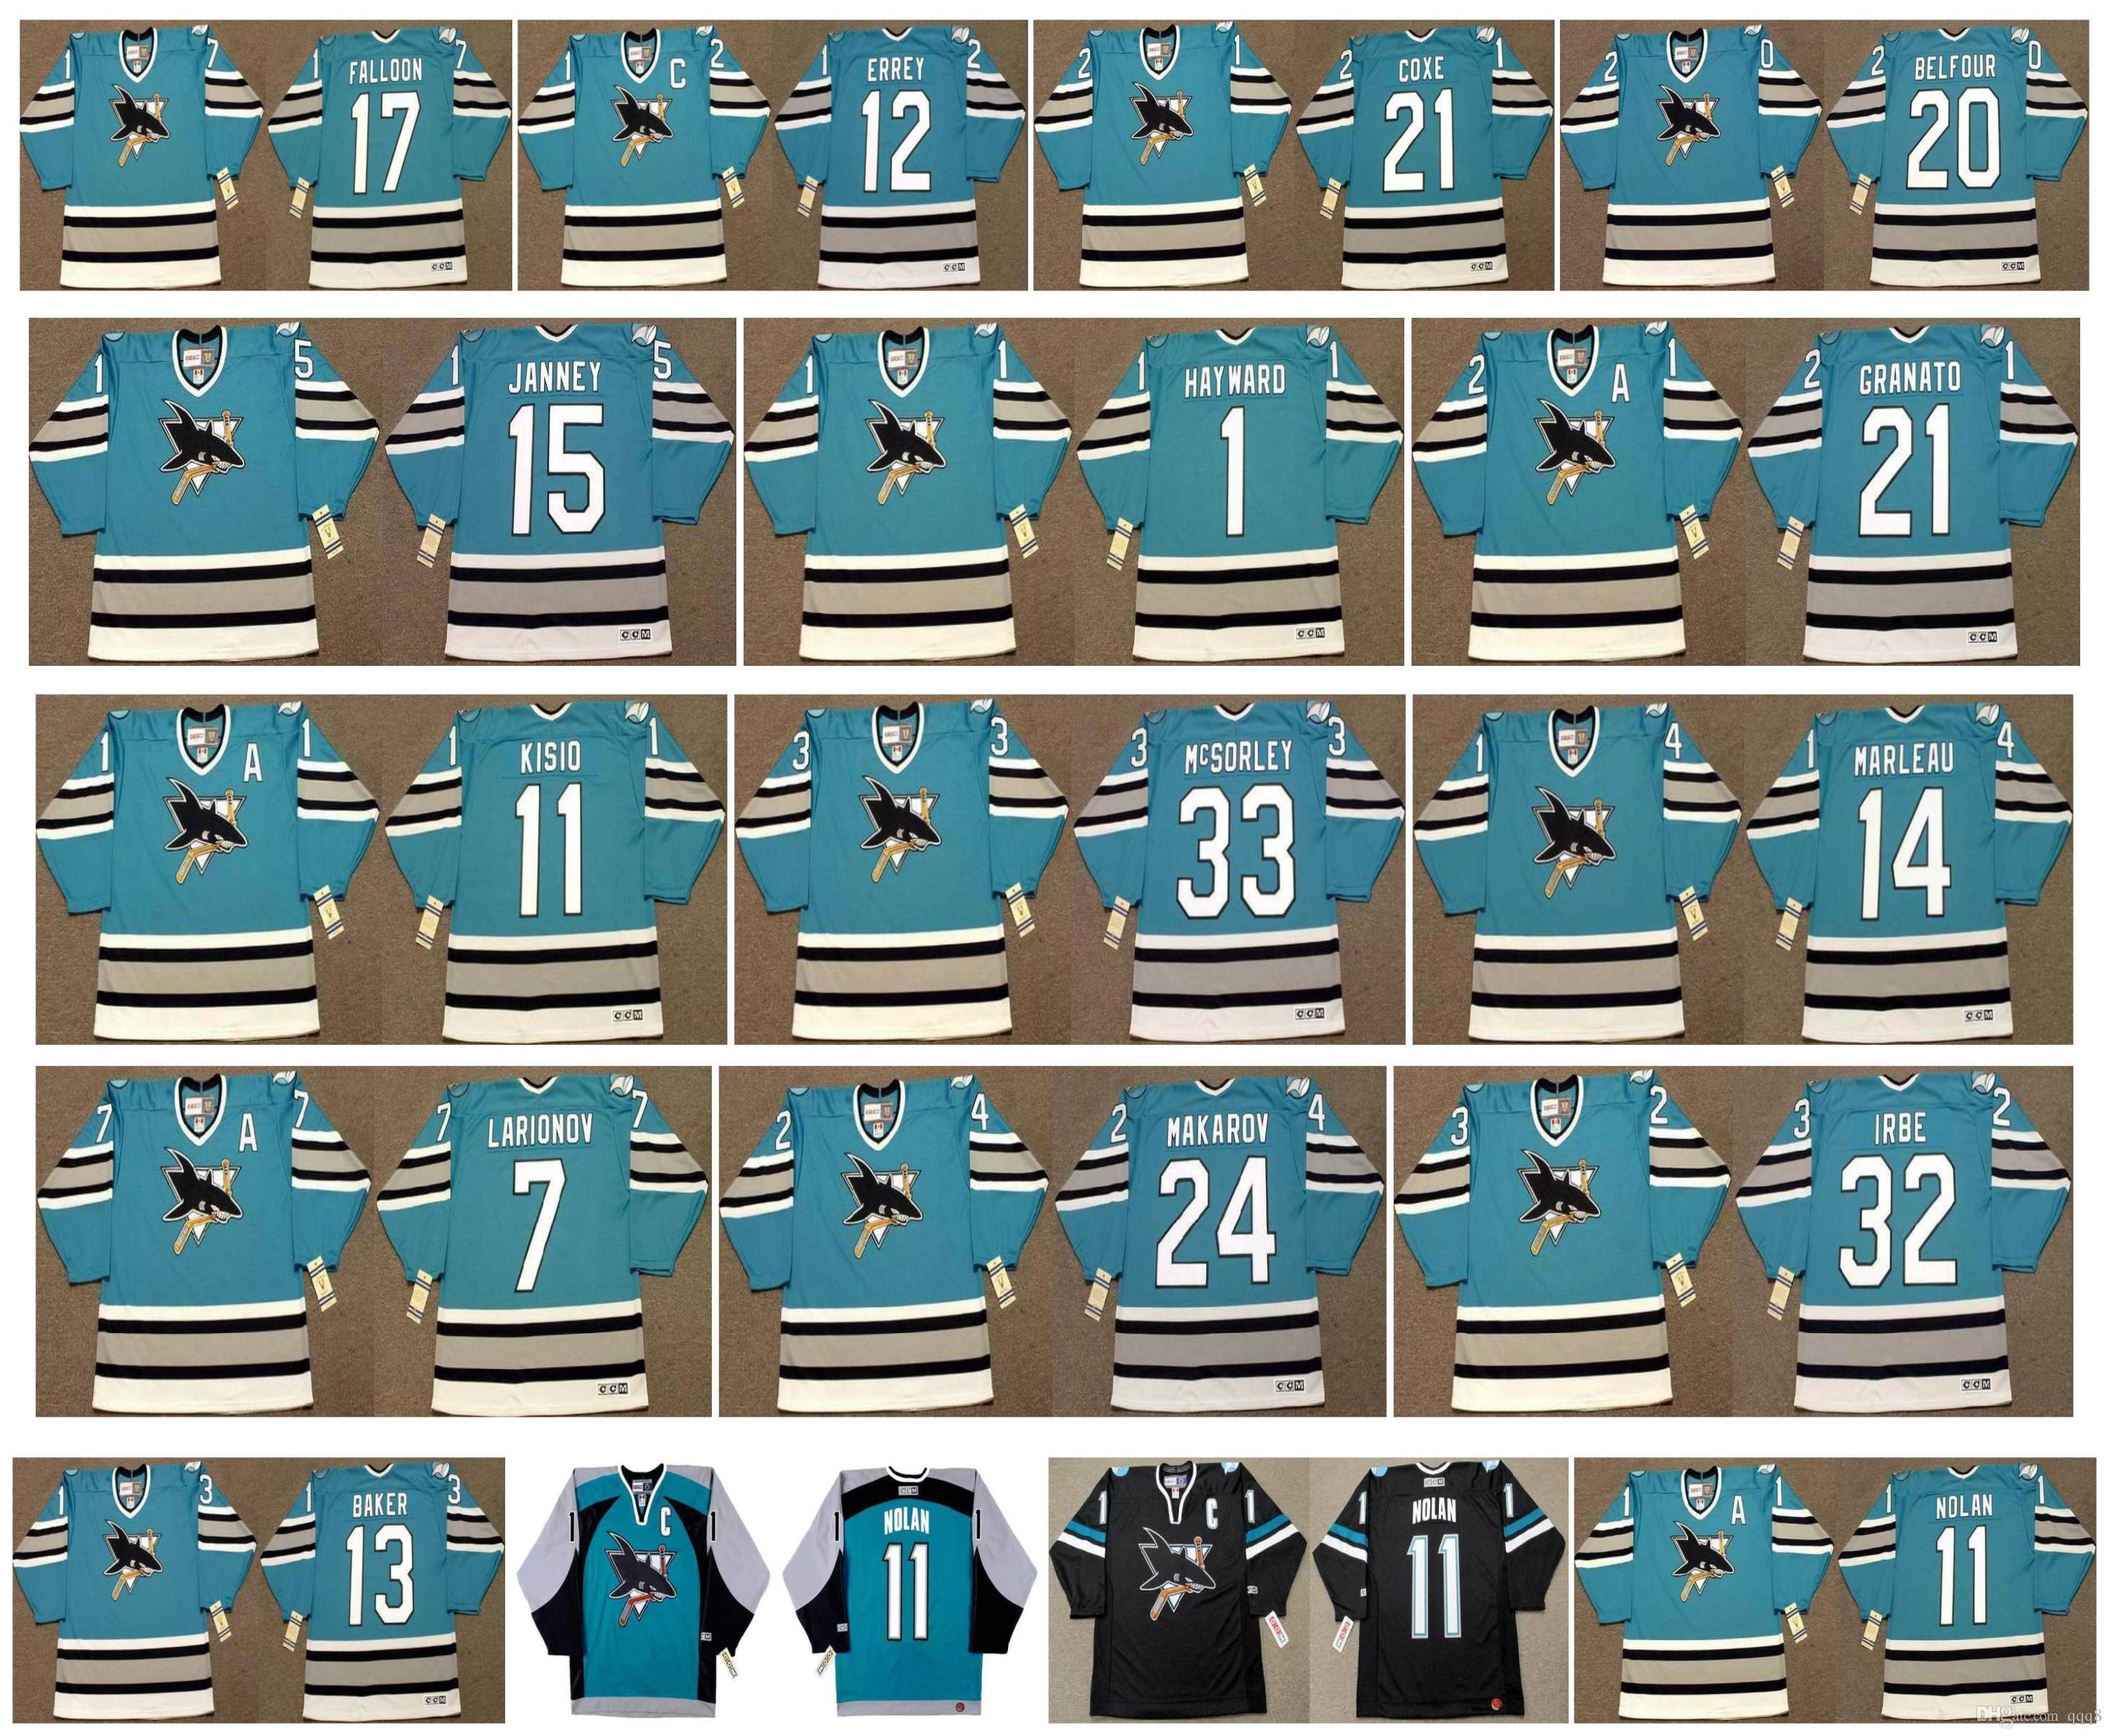 Vintage San Jose Sharks Jersey 32 ARTURS IRBE 1 HAYWARD 21 GRANATO 17 PAT FALLOON 12 BOB ERREY 21 CRAIG COXE 20 BELFOUR 13 BAKER CCM Hockey